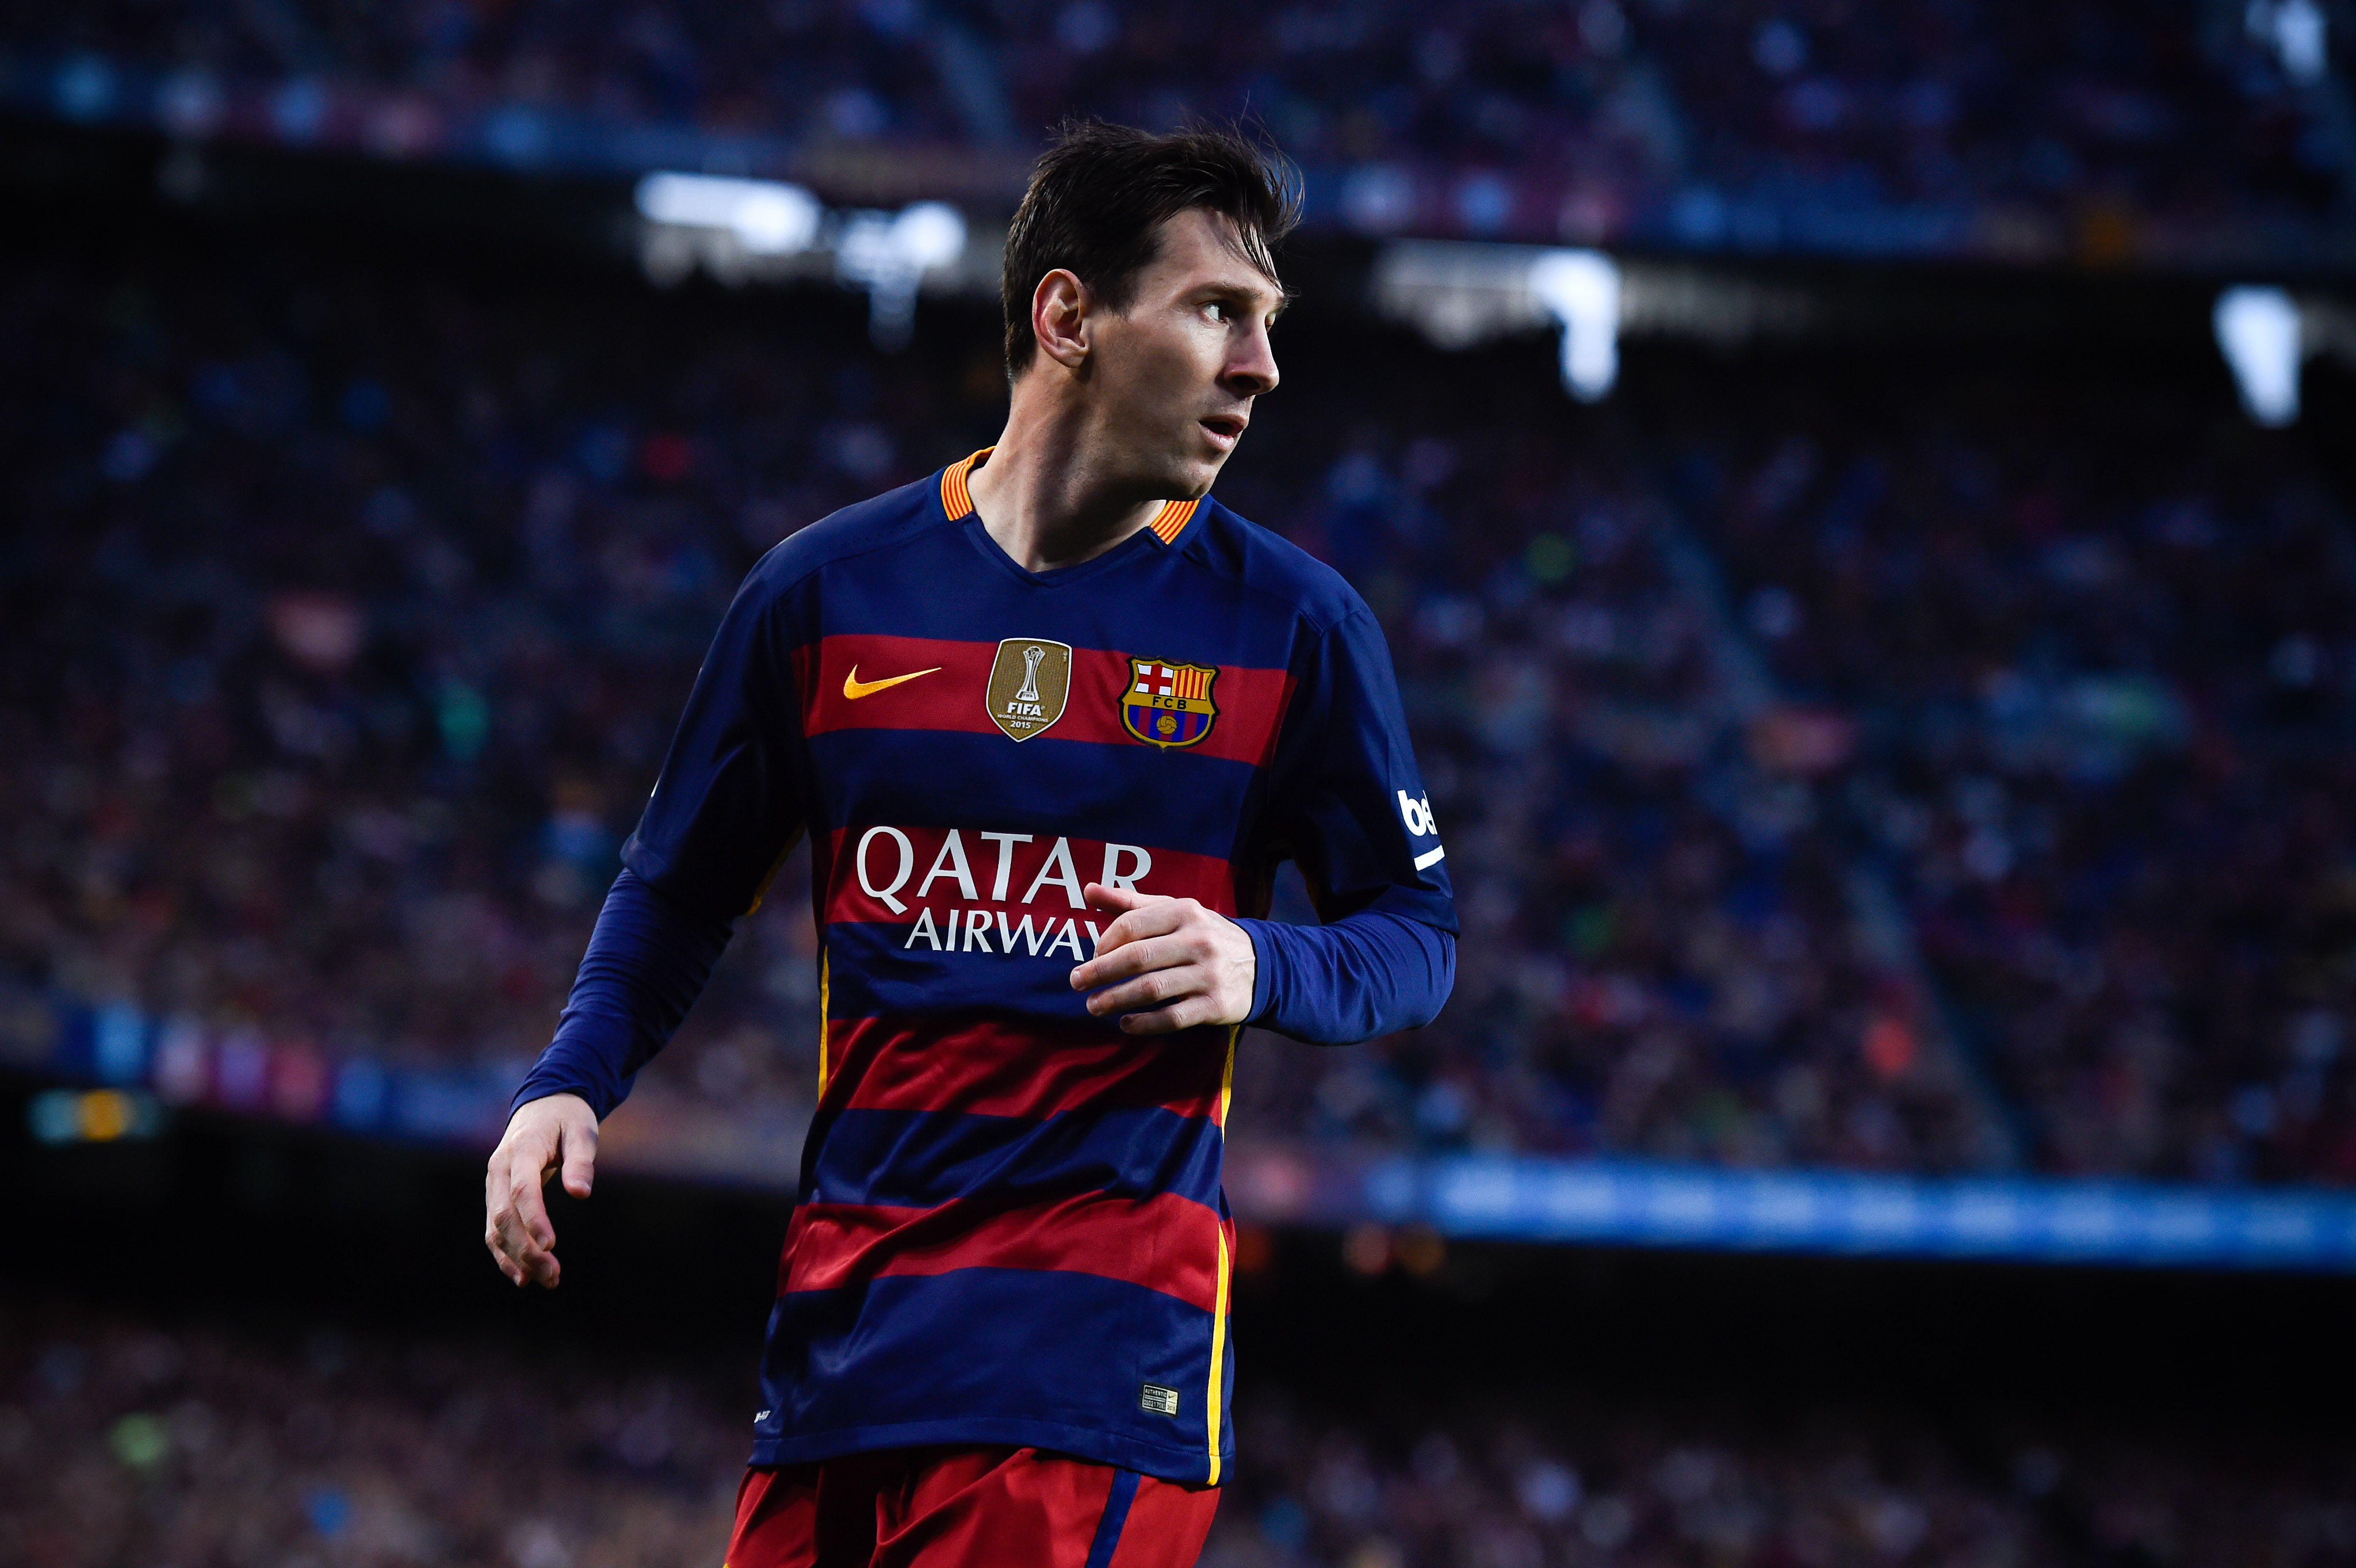 Profile of Barcelona Soccer Player Lionel Messi